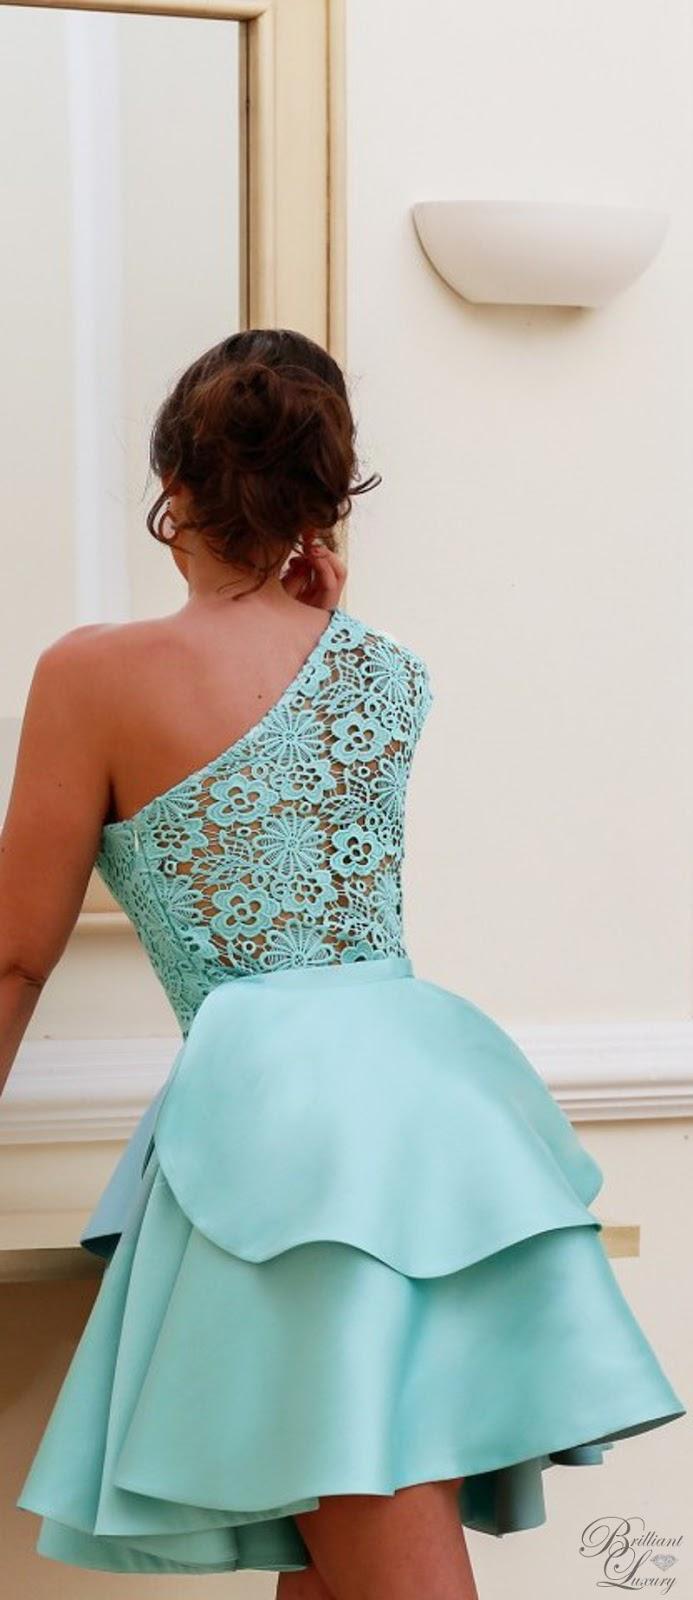 Brilliant Luxury ♦ Silvia Navarro turquoise Sia layered dress